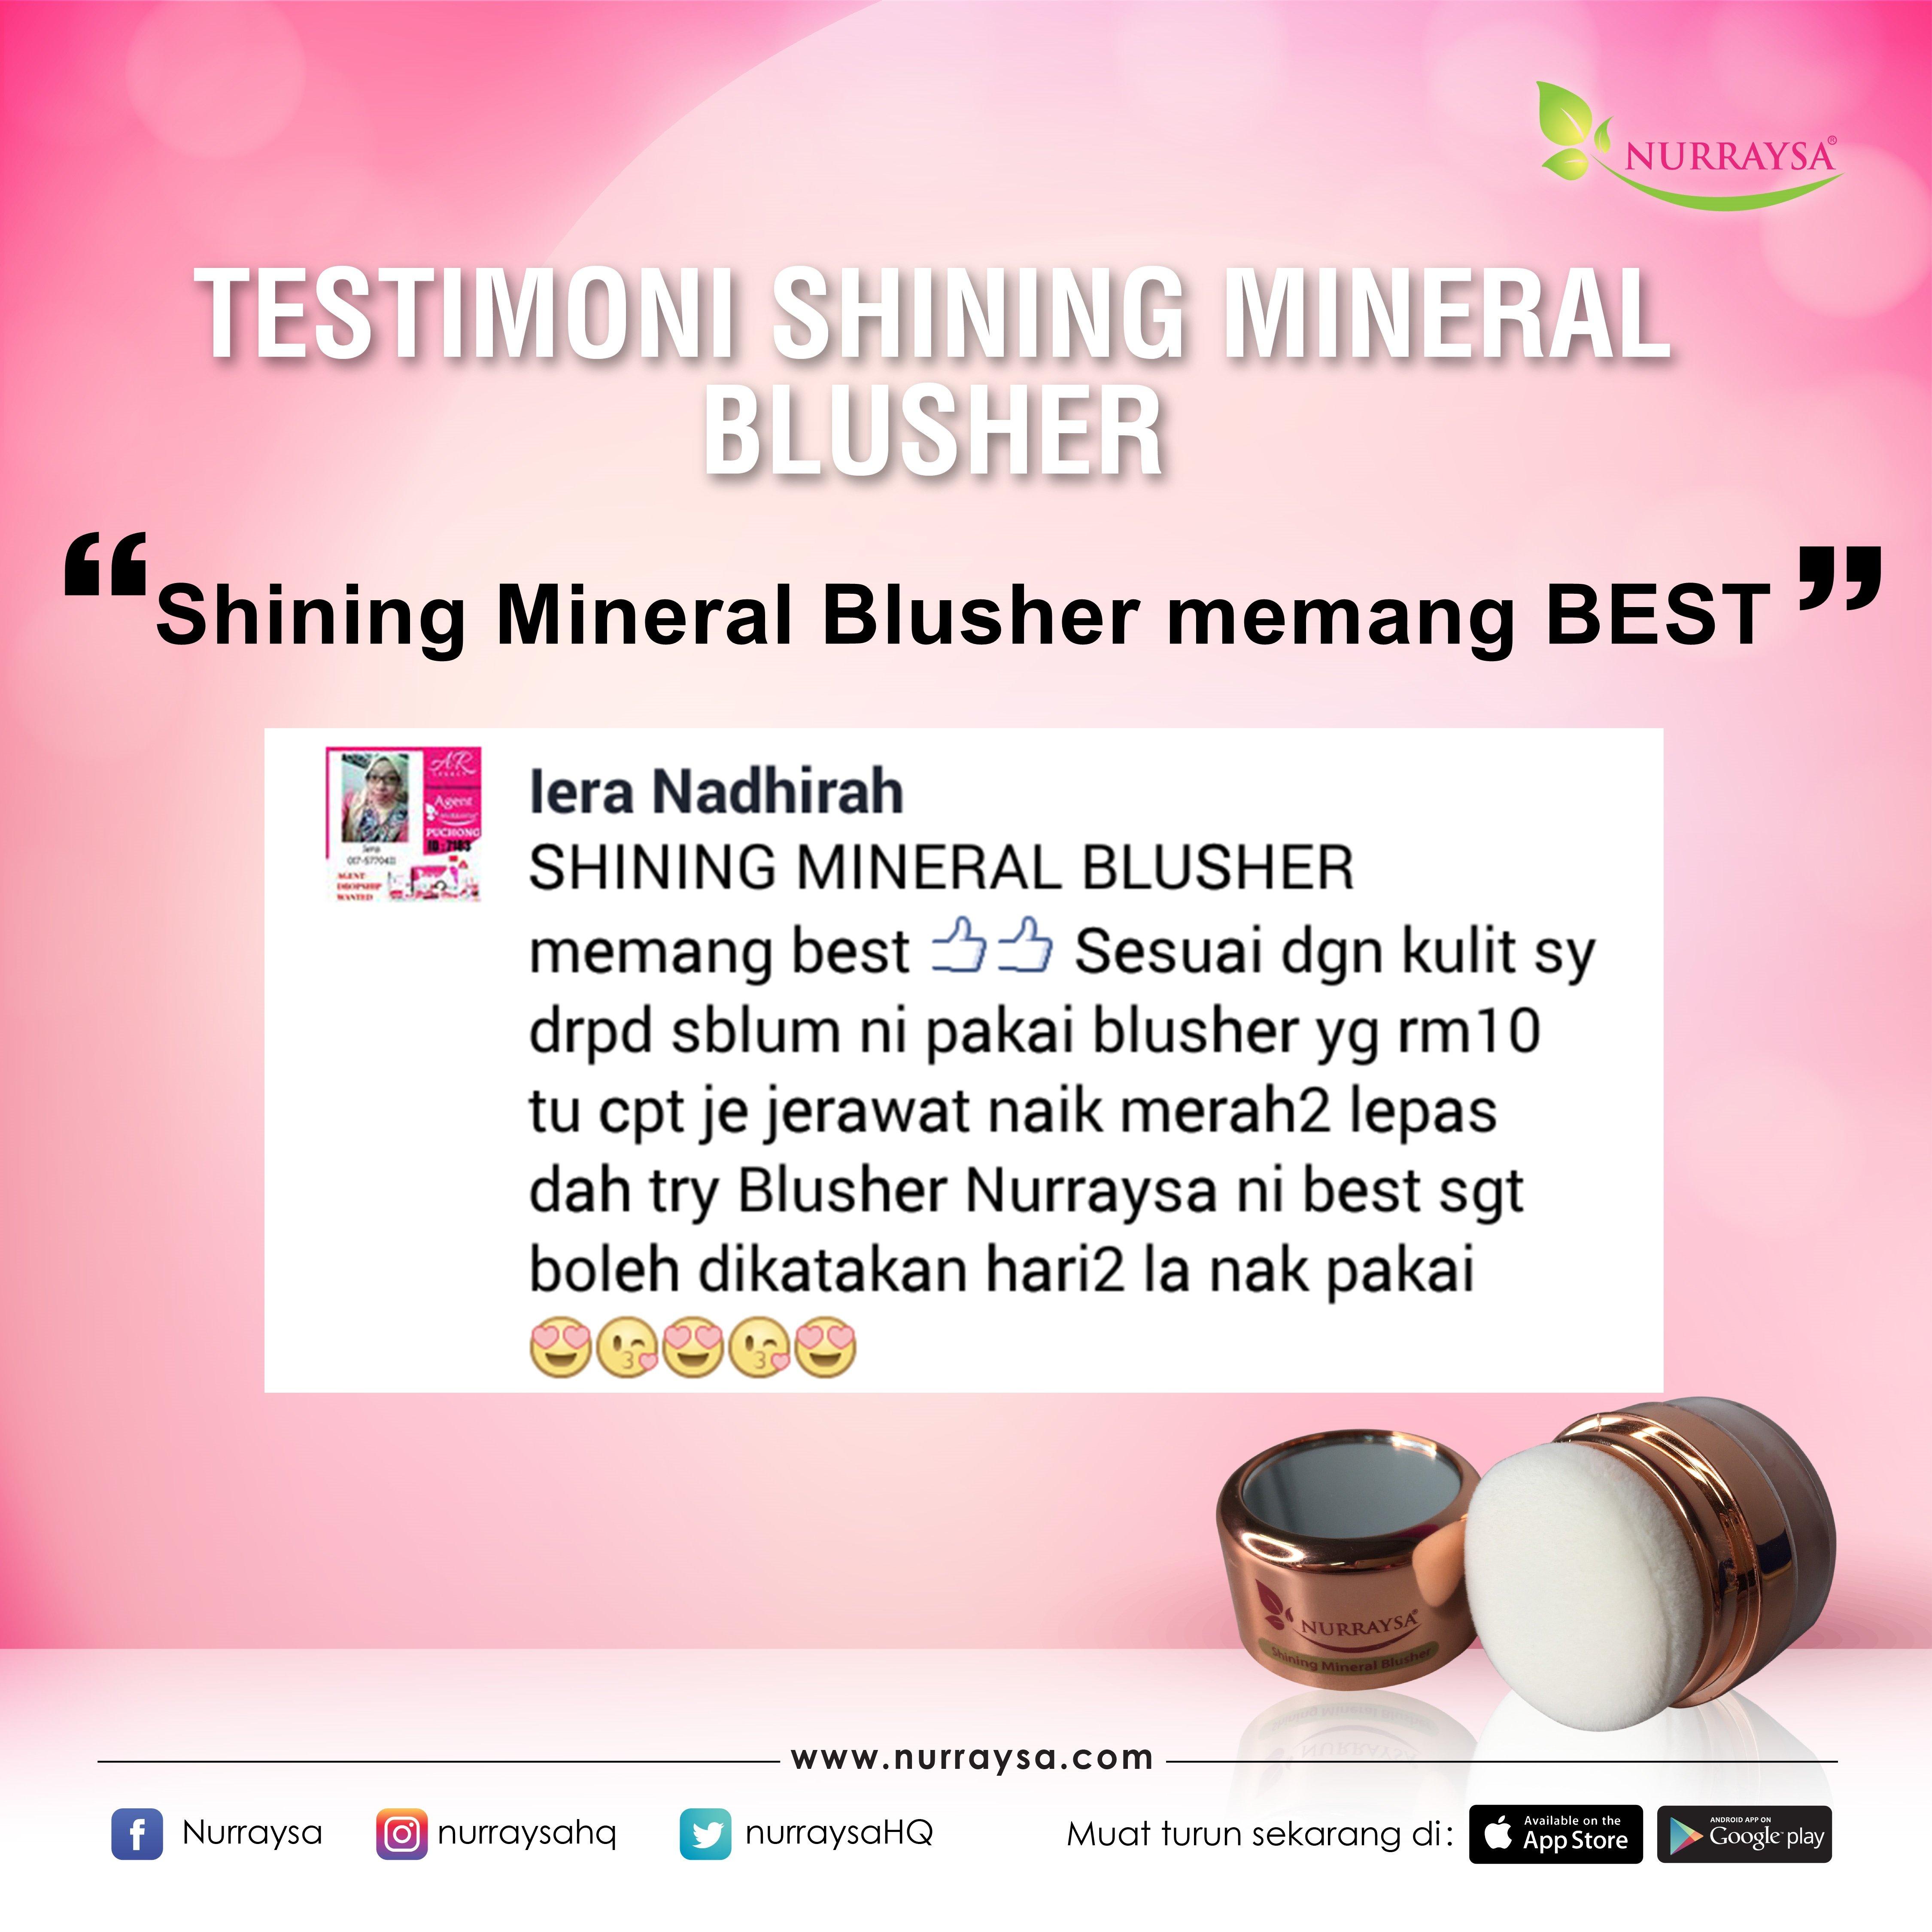 Testimoni Mineral Blusher 5